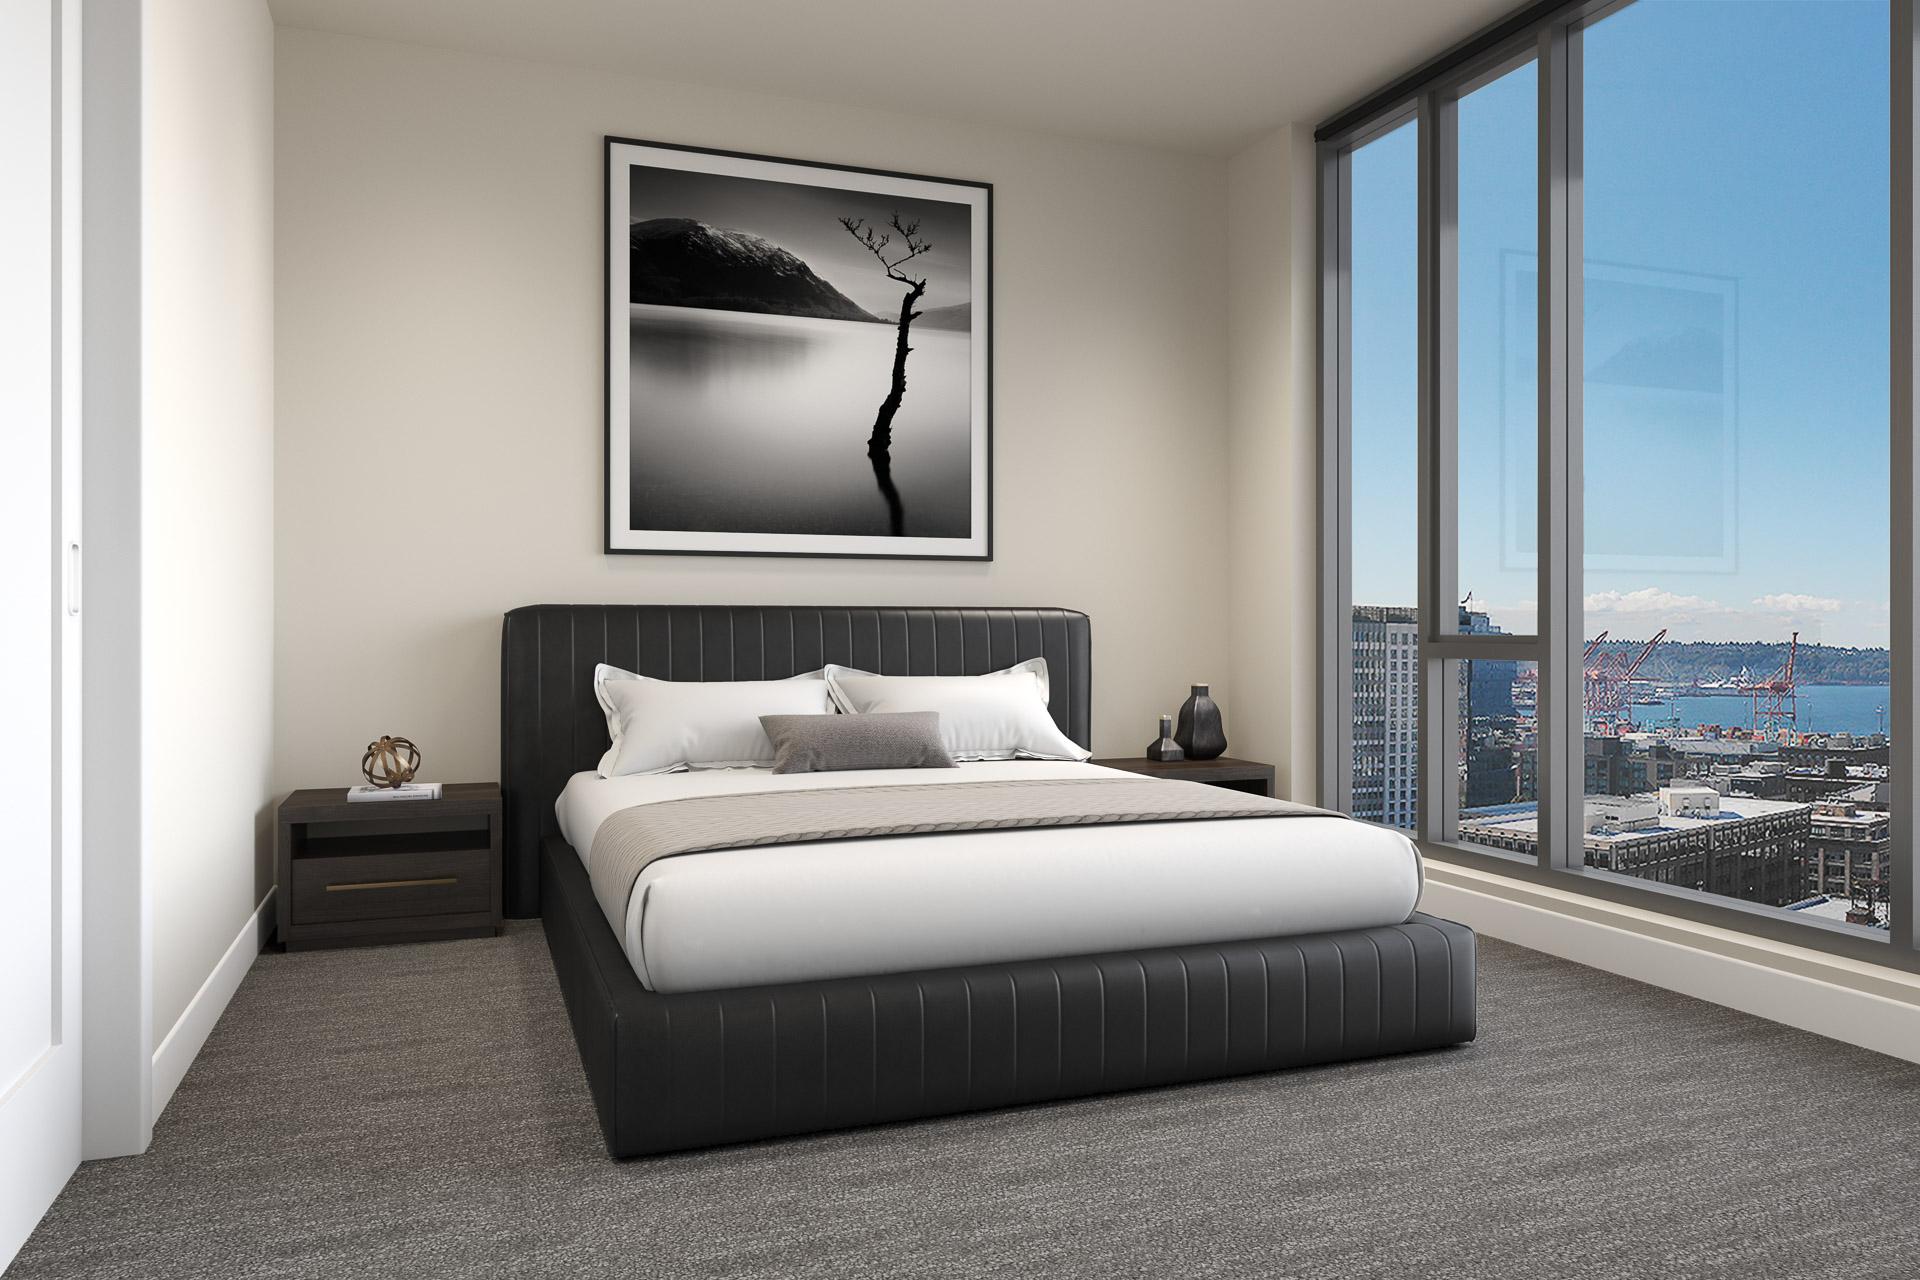 KODACondos_Interior_Unit1705_Bedroom_Cam1_Medium_030719